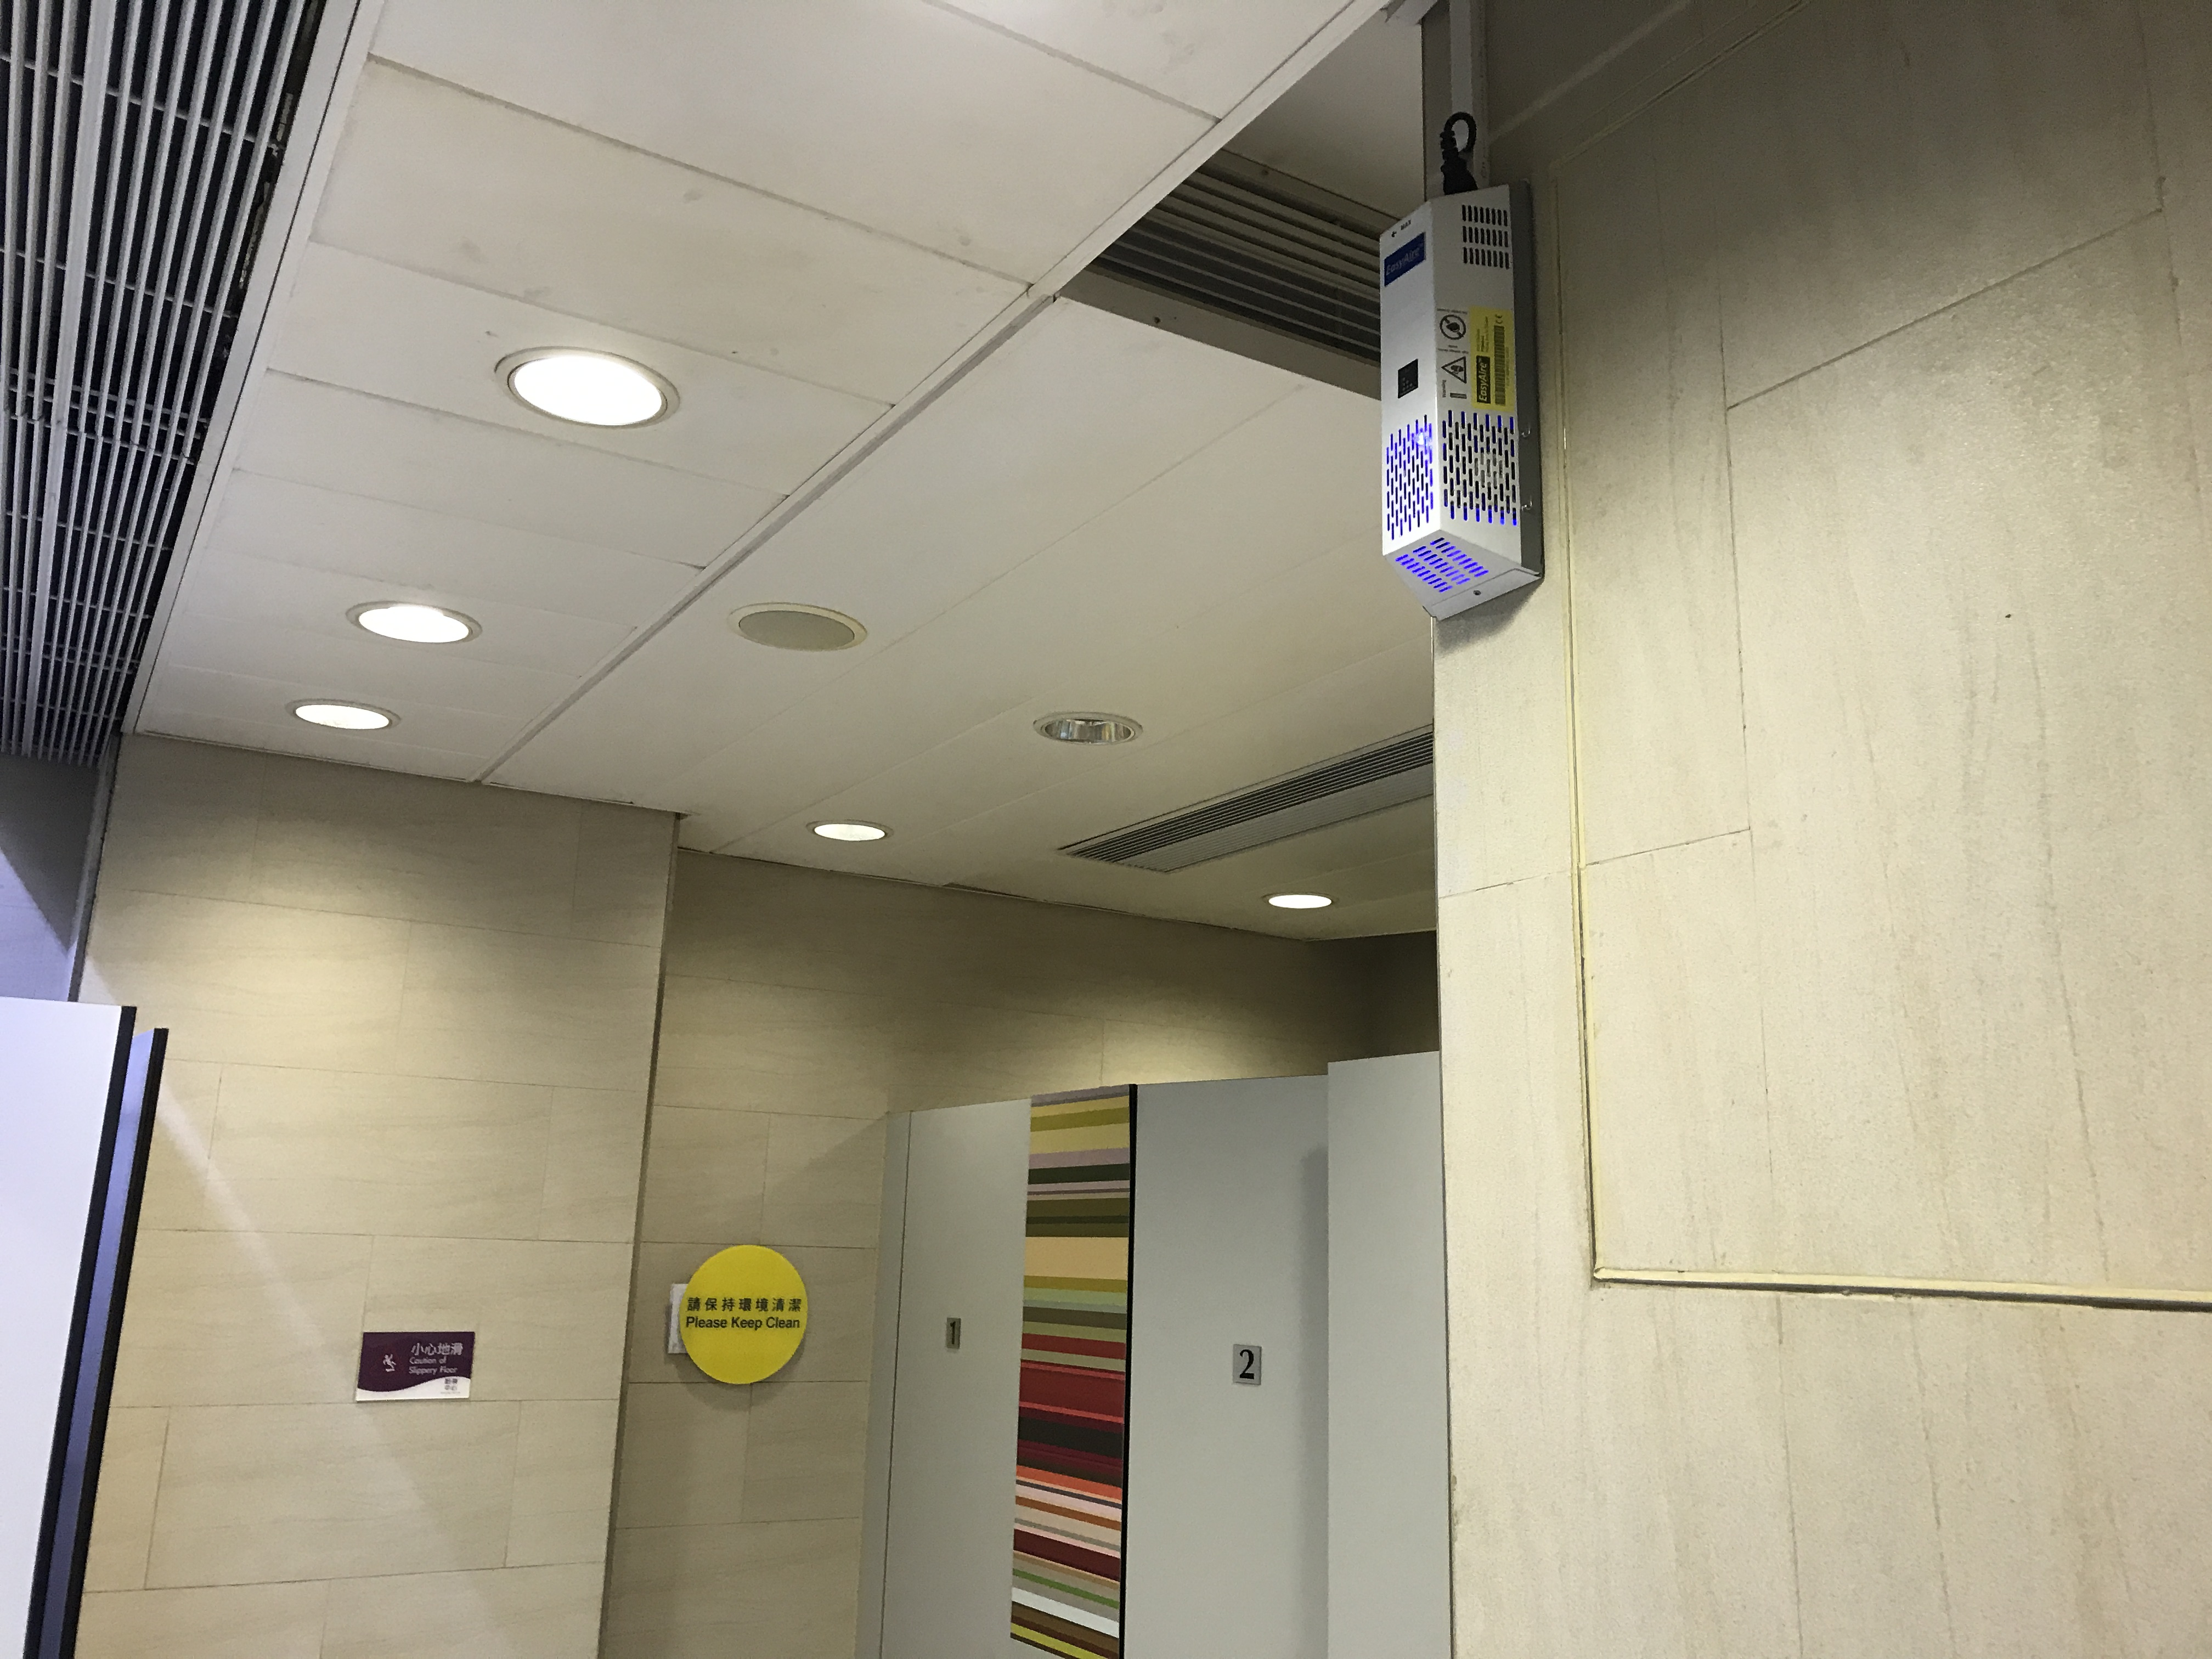 EASYAIRE MULTI-SOLUTIONS IN WASHROOM